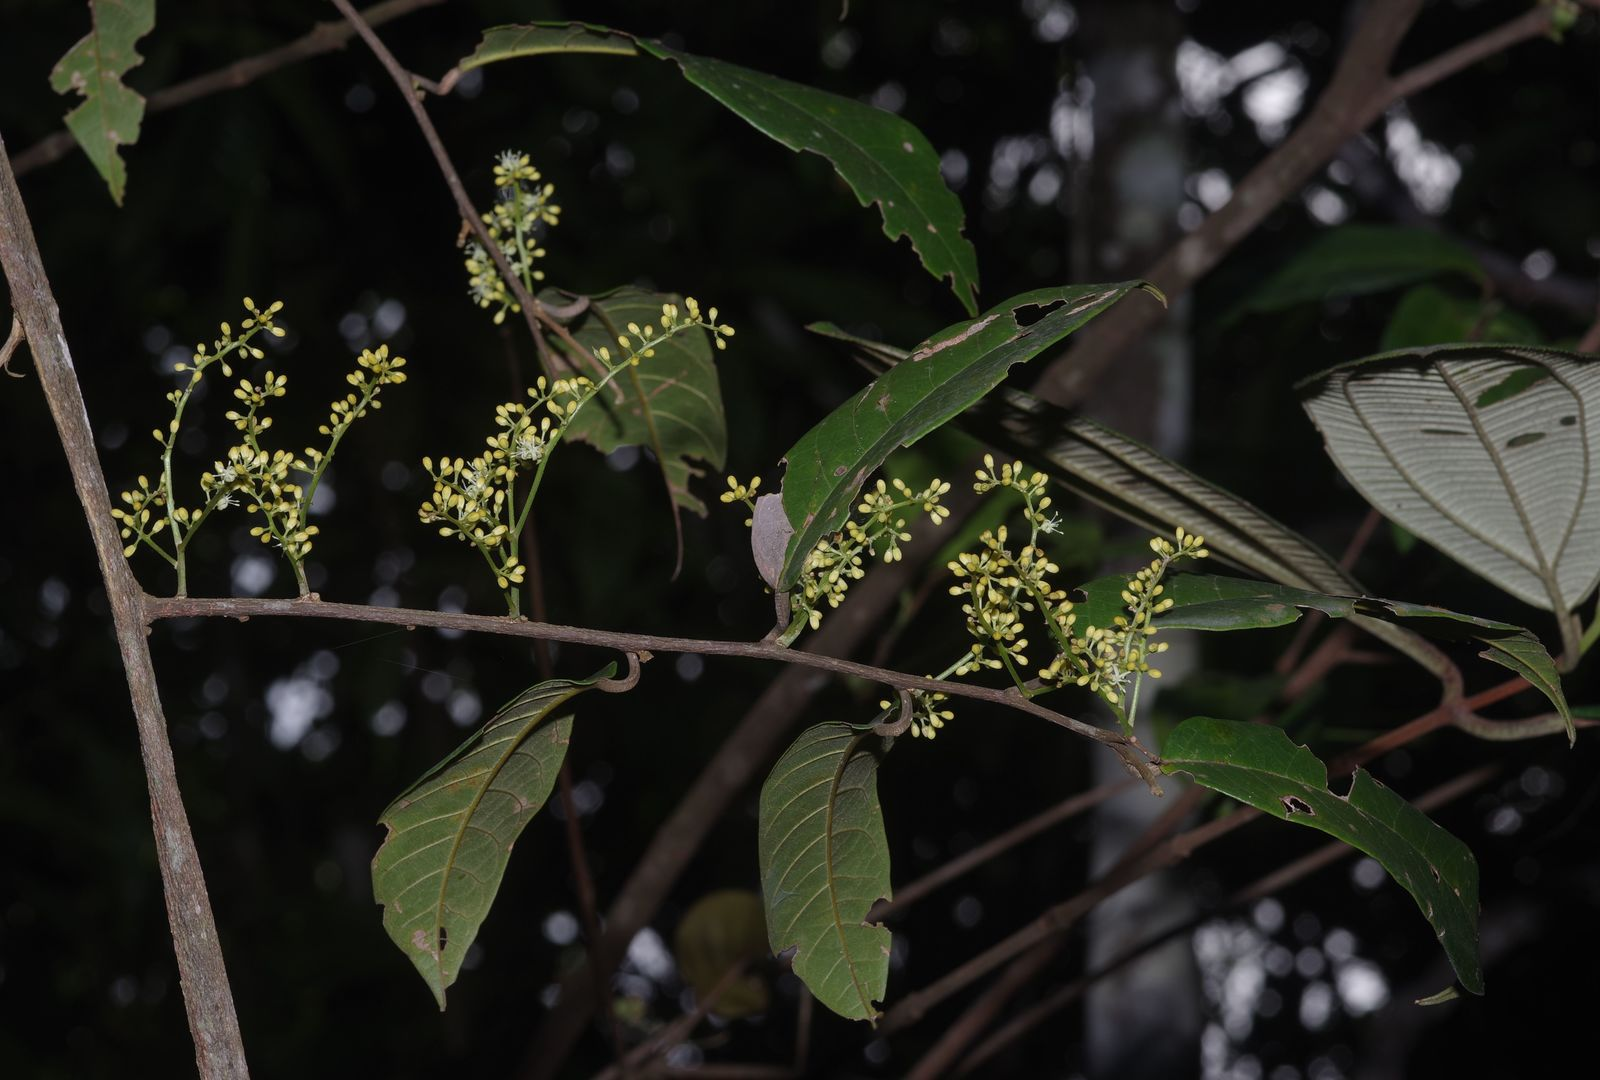 Pleurisanthes parviflora